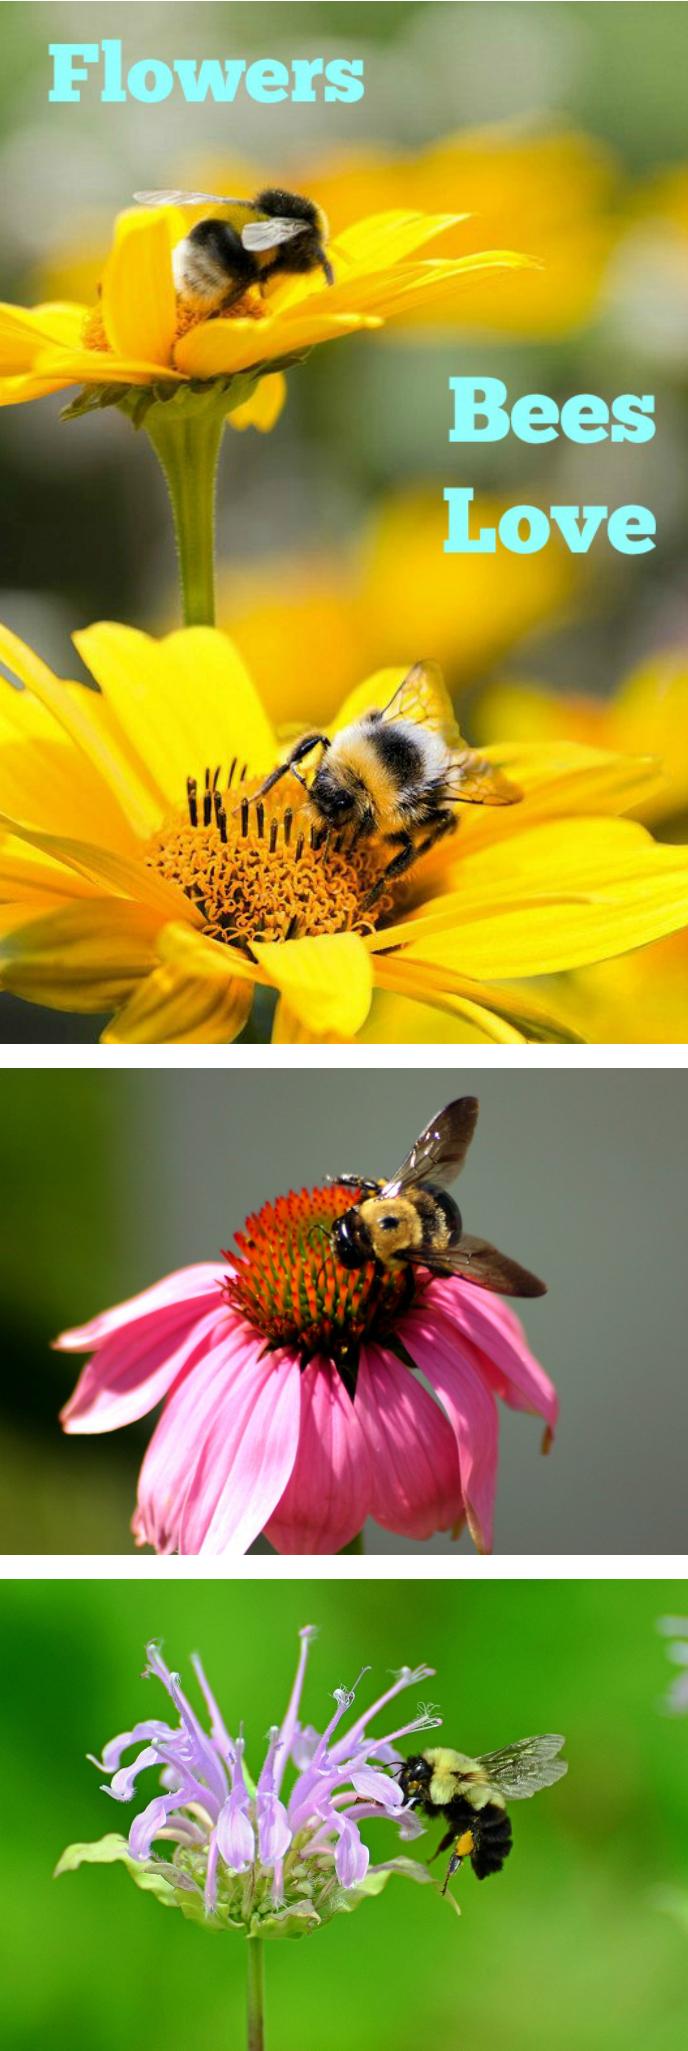 Flowers Bees Love